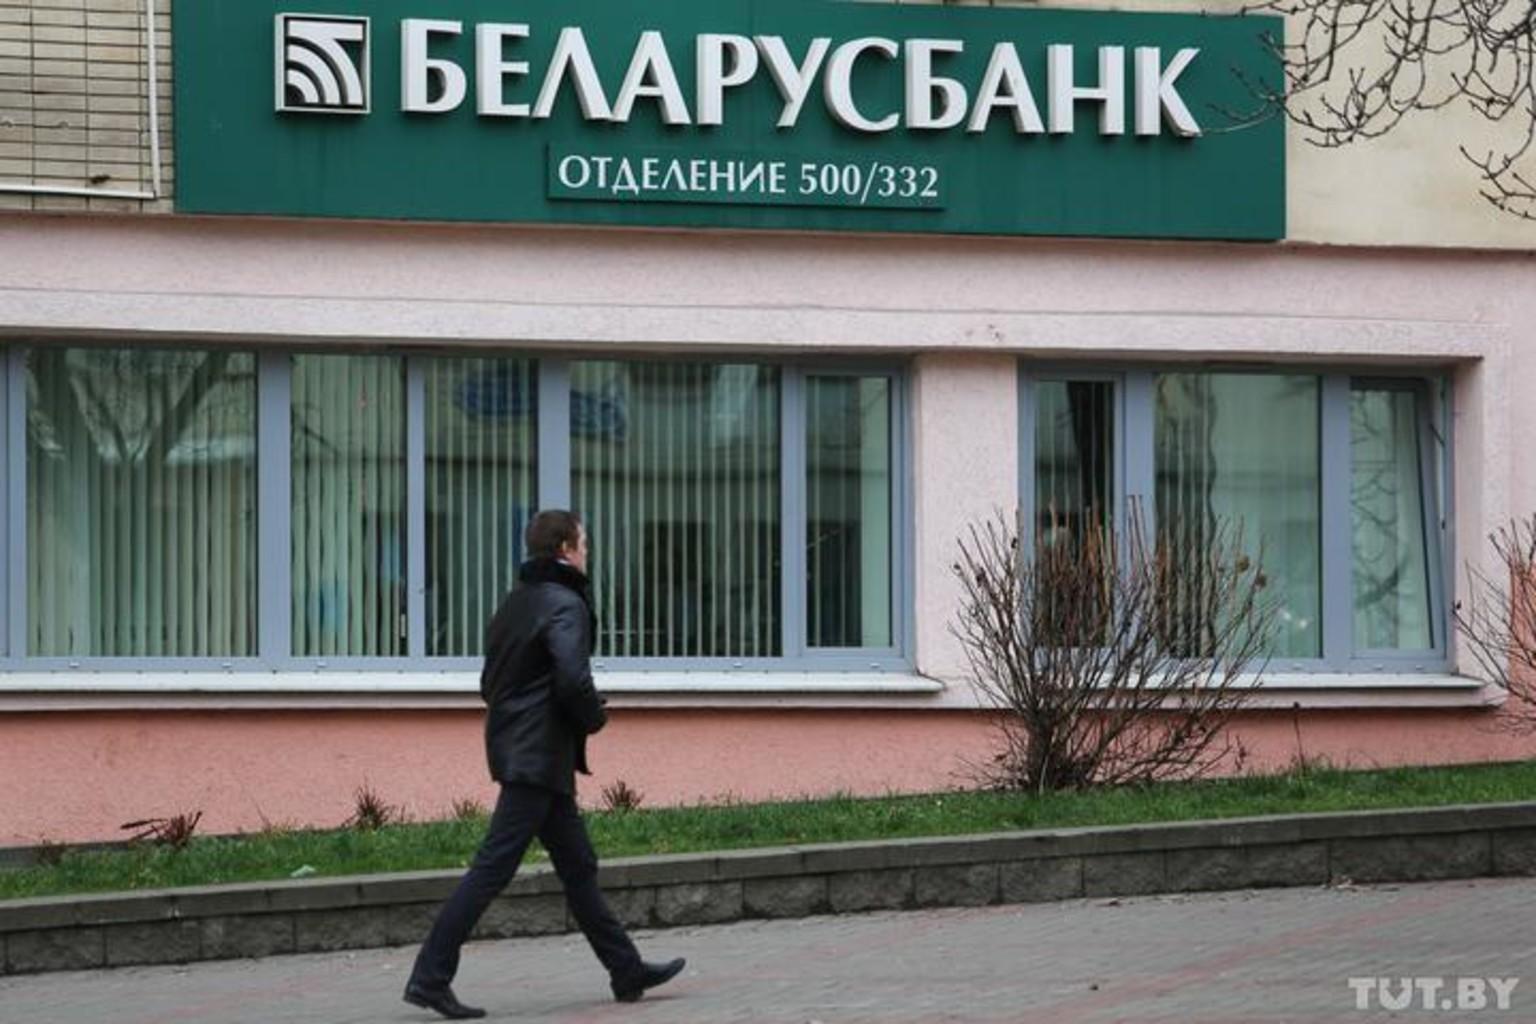 20131126 zam illustr phsl tutby belarusbank 02